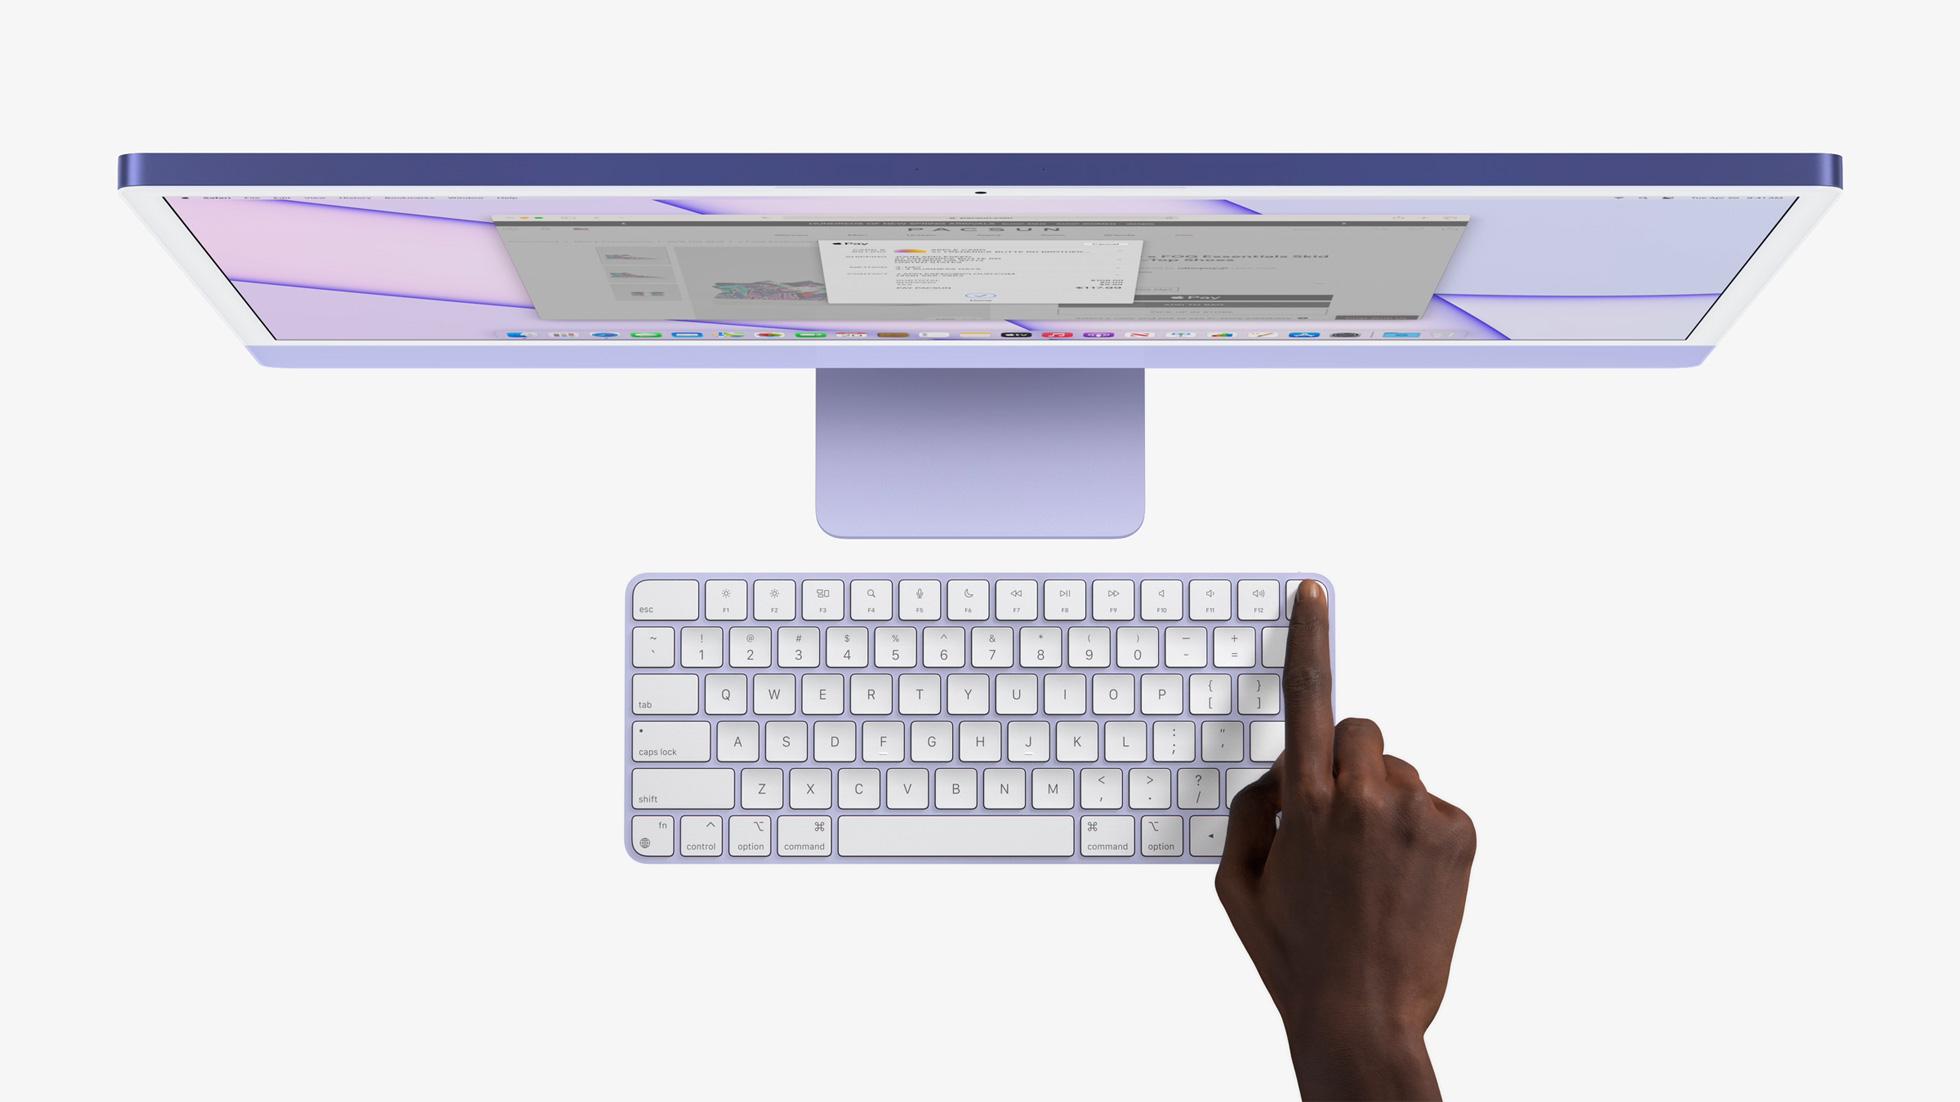 iMac 2021 in purple showing Touch ID on keyboard